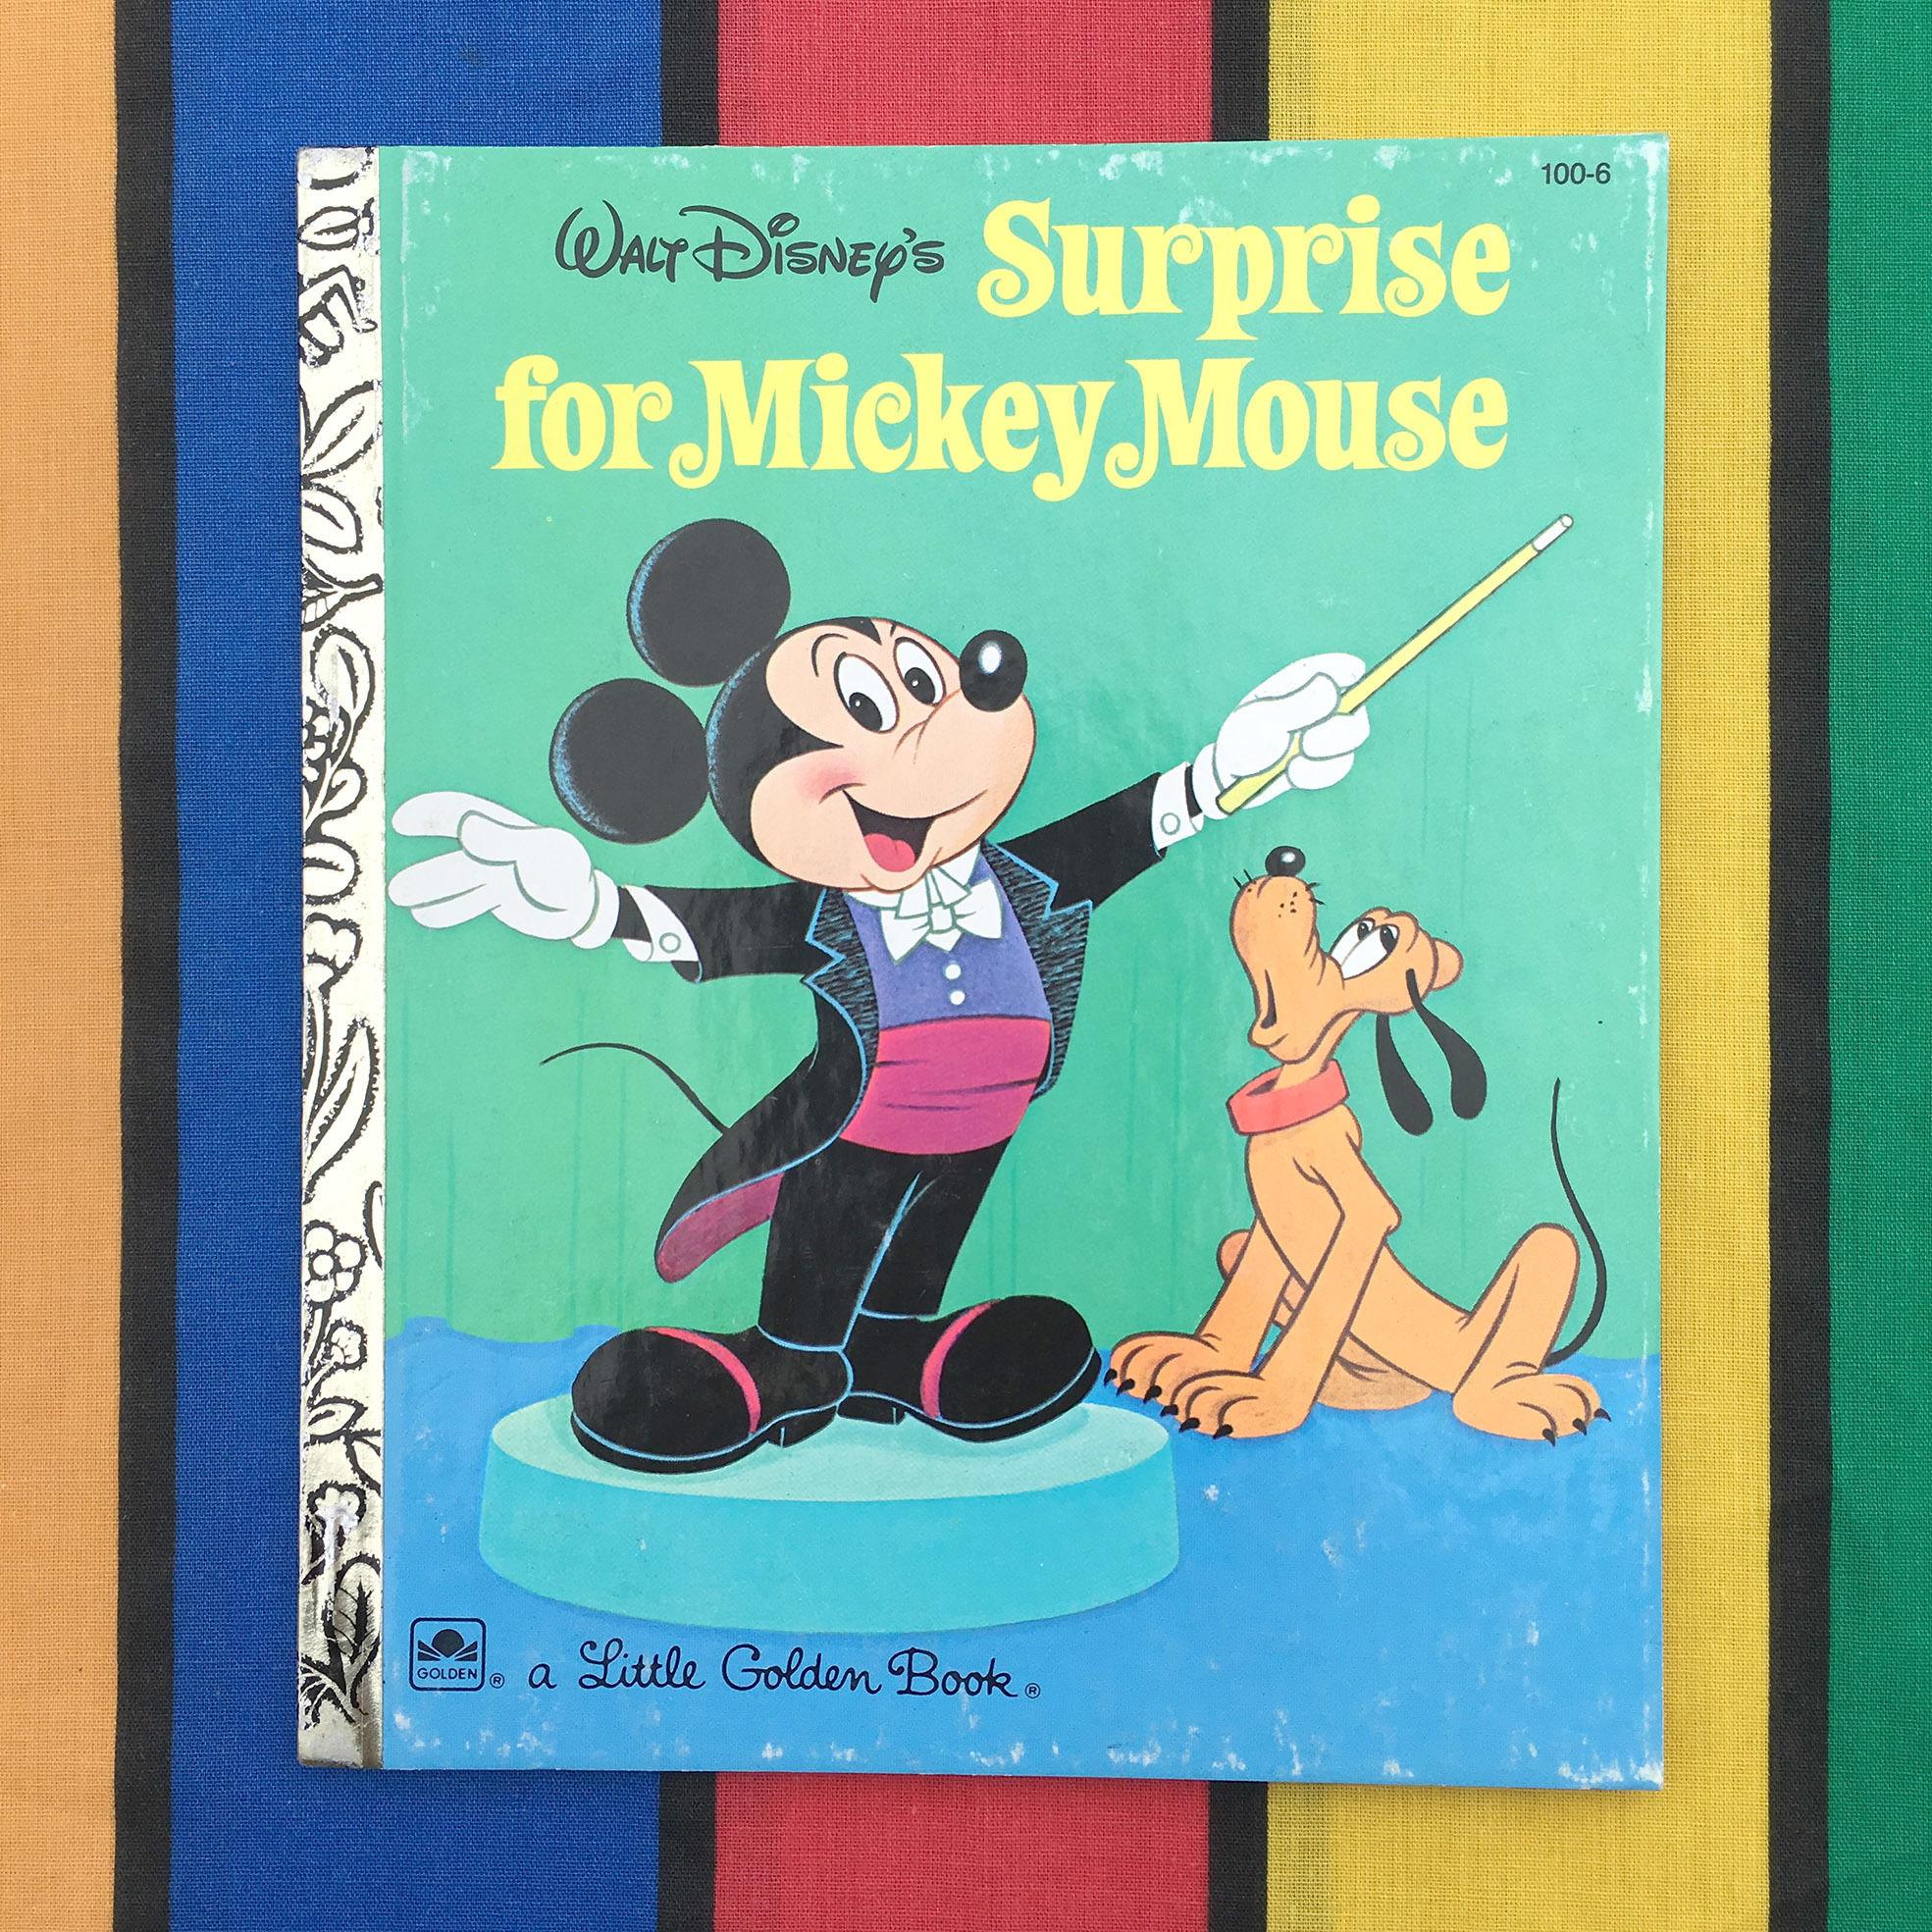 Disney Surprise for Mickey Mouse/ディズニー ミッキー・マウスへサプライズ 絵本/160727-11